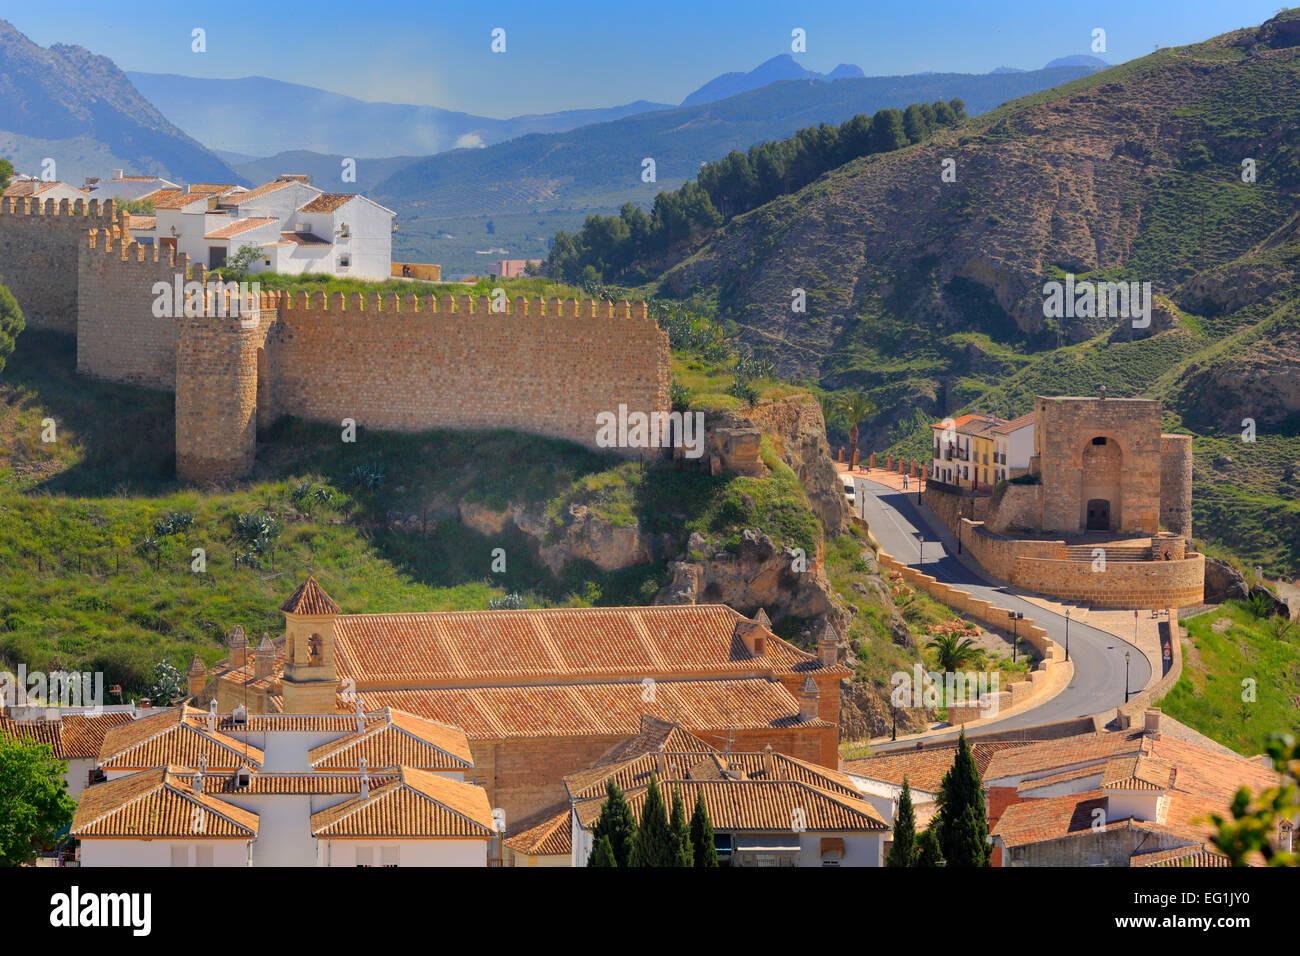 Alcazaba (castle), Antequera, Andalusia, Spain - Stock Image